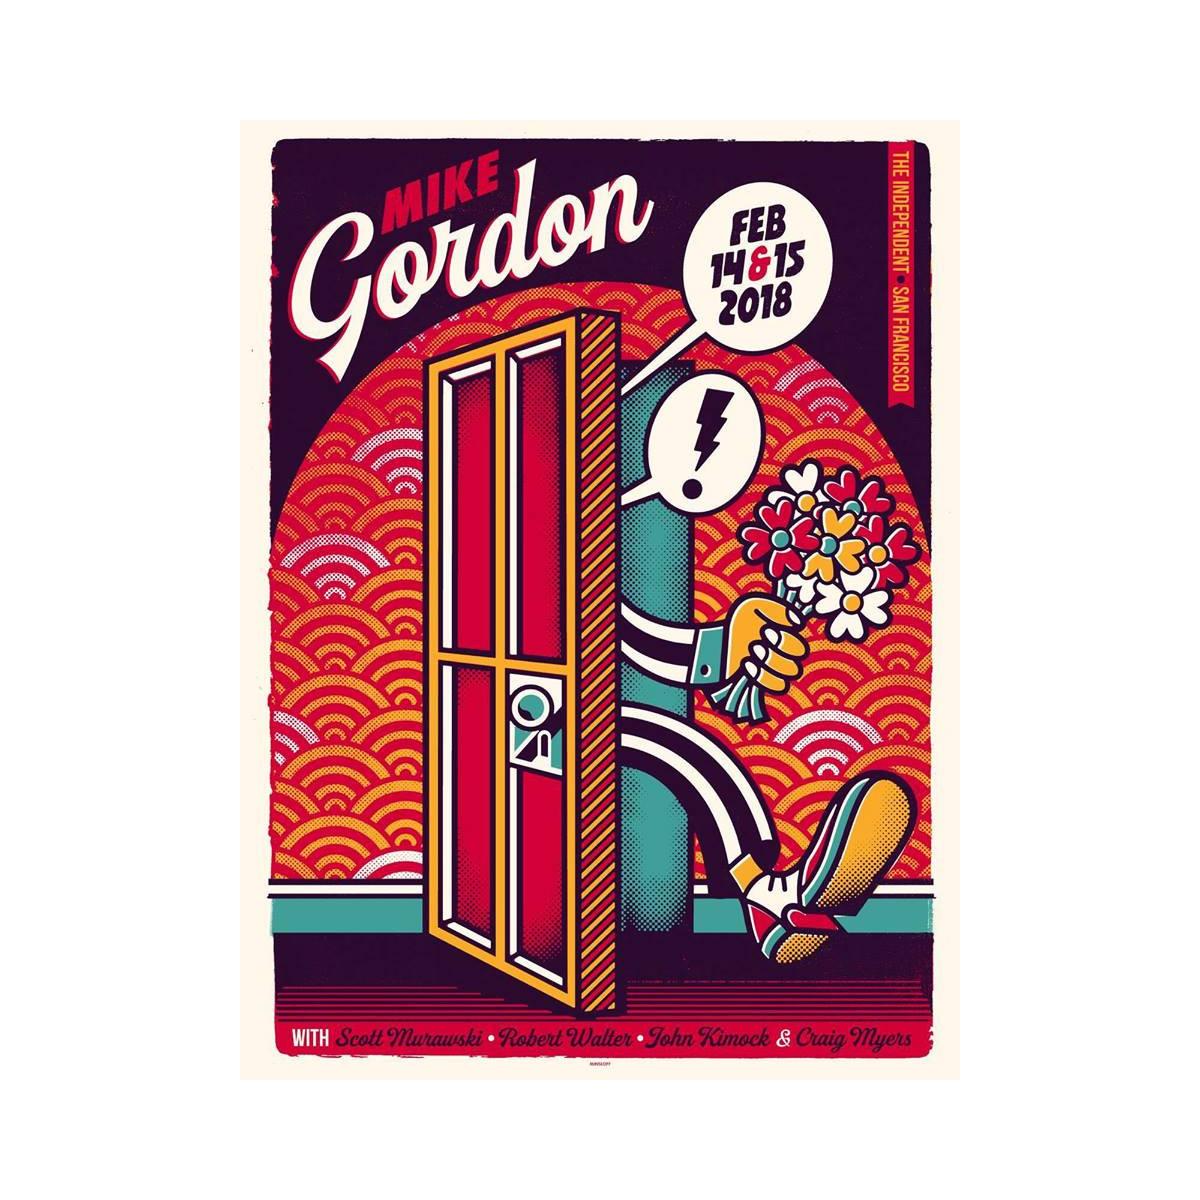 Mike Gordon San Francisco LE Poster